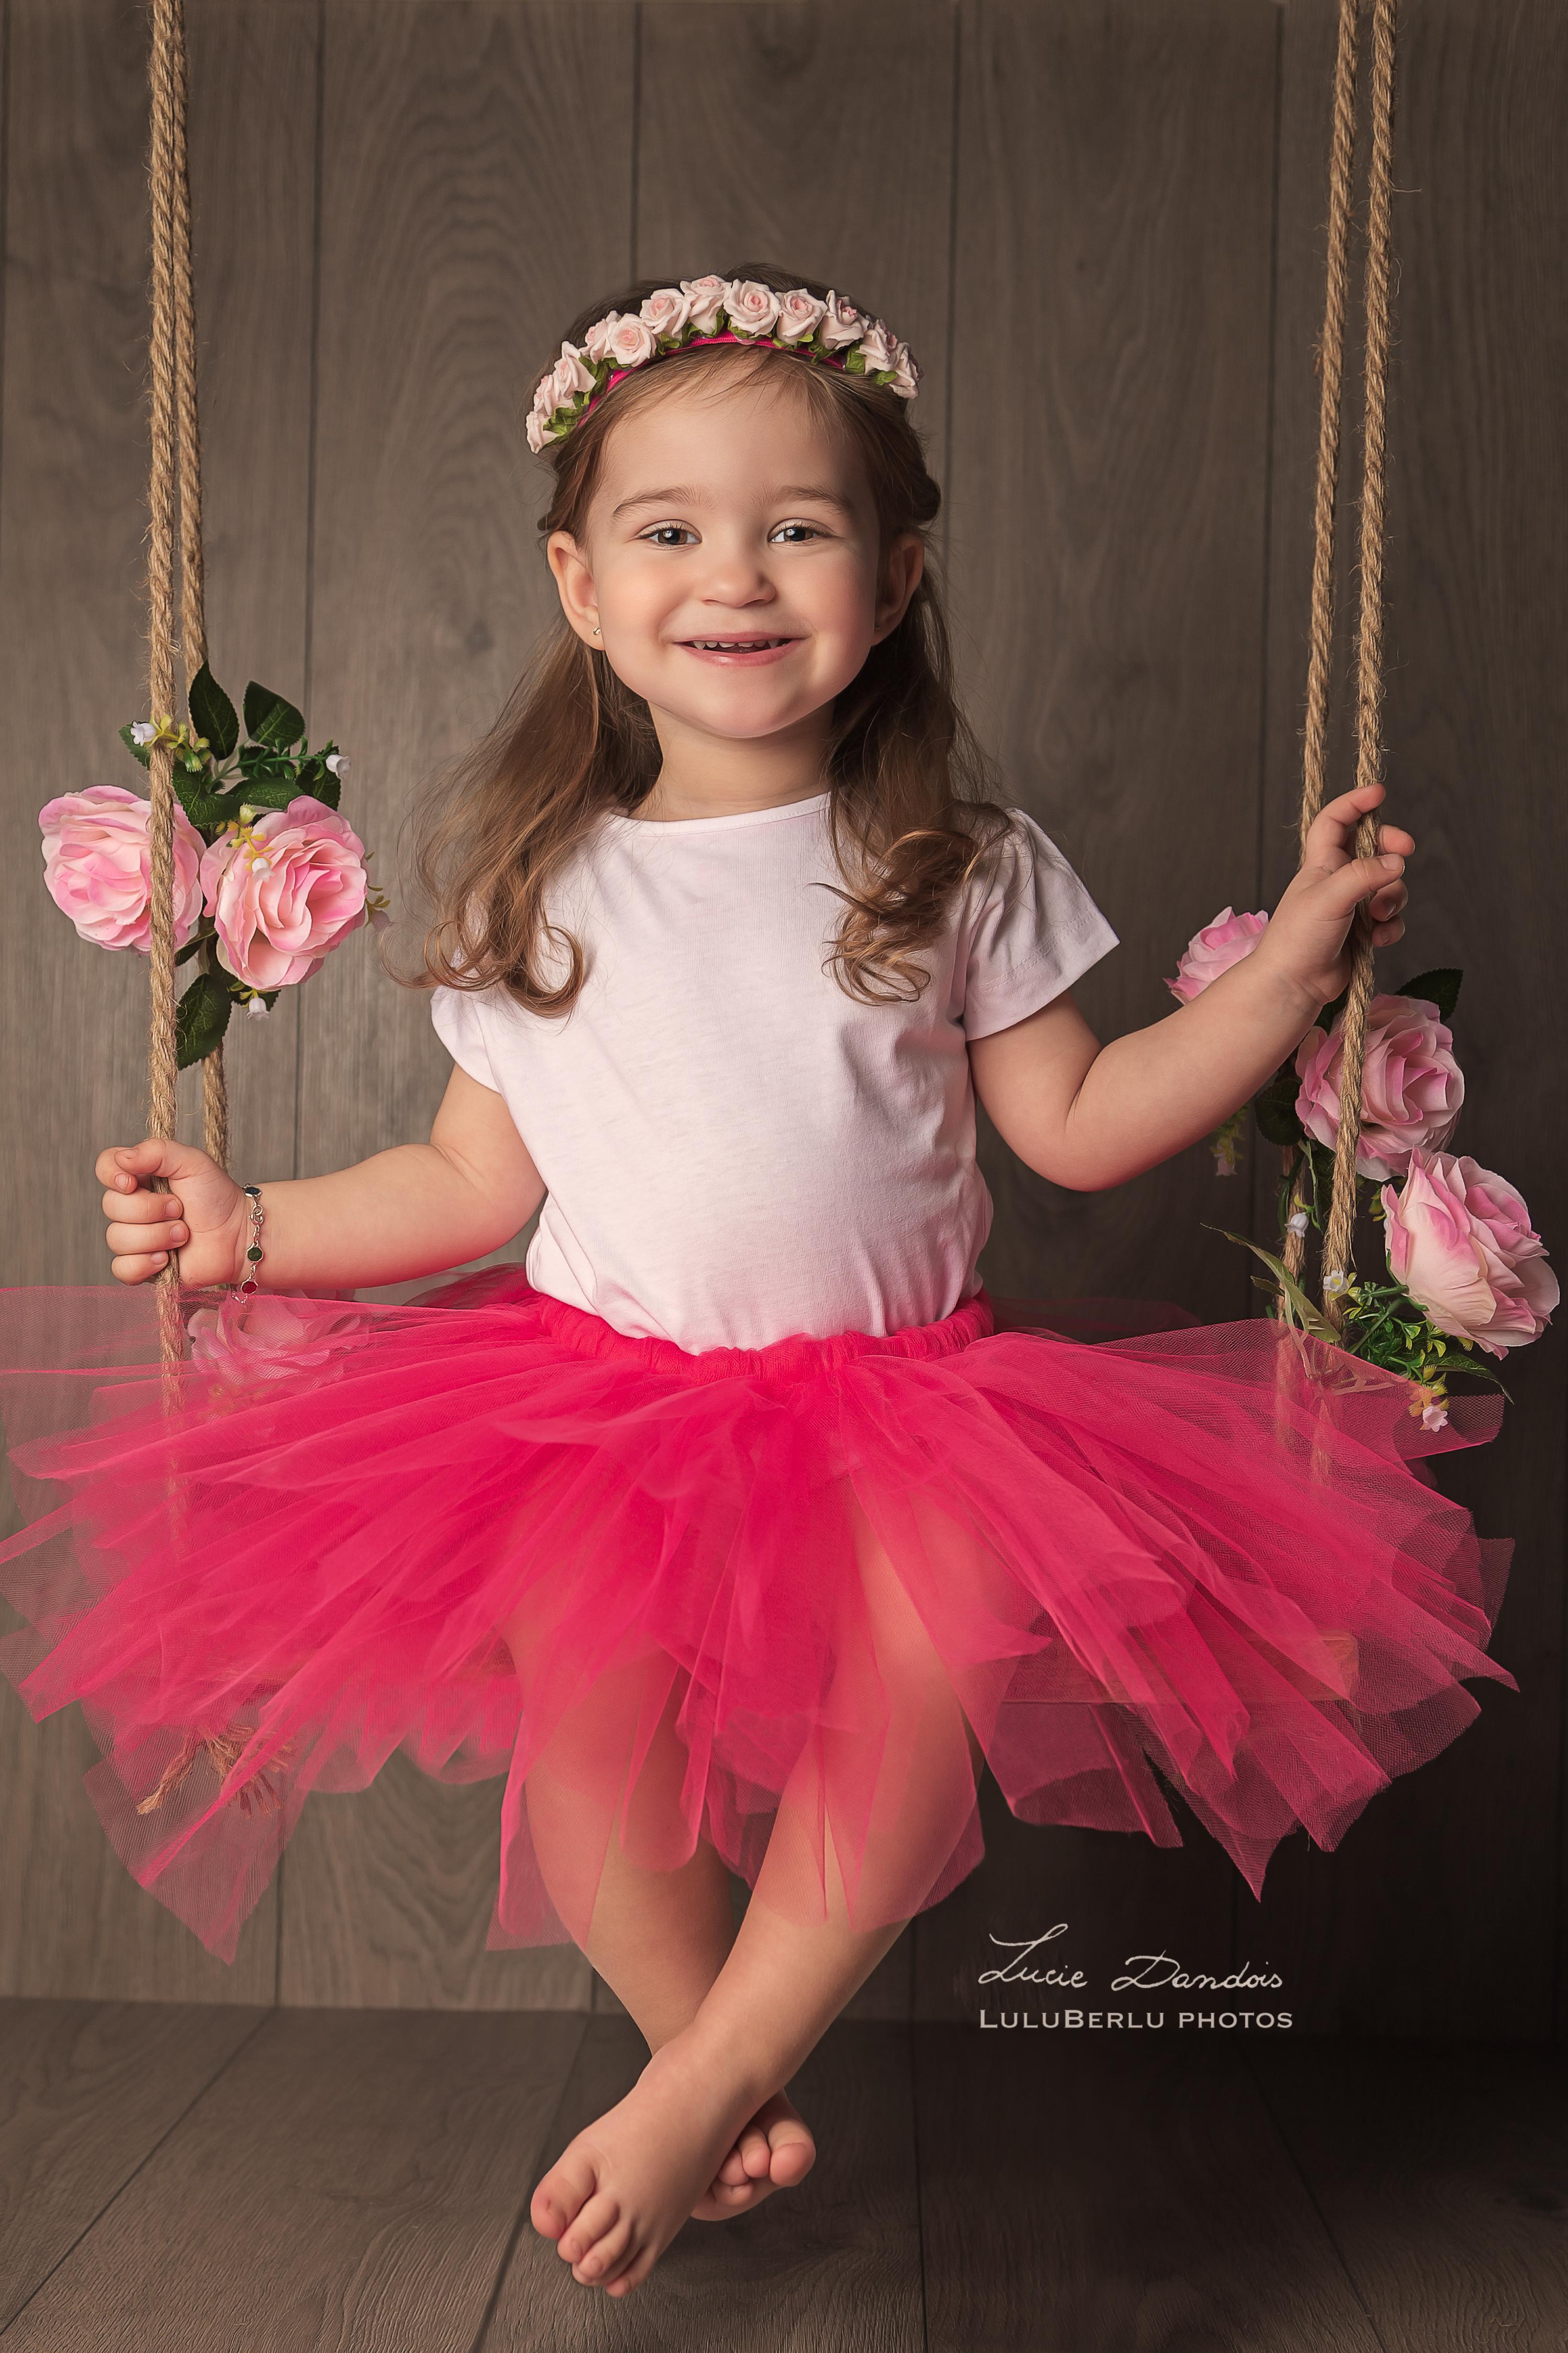 photographe pour enfant charleroi